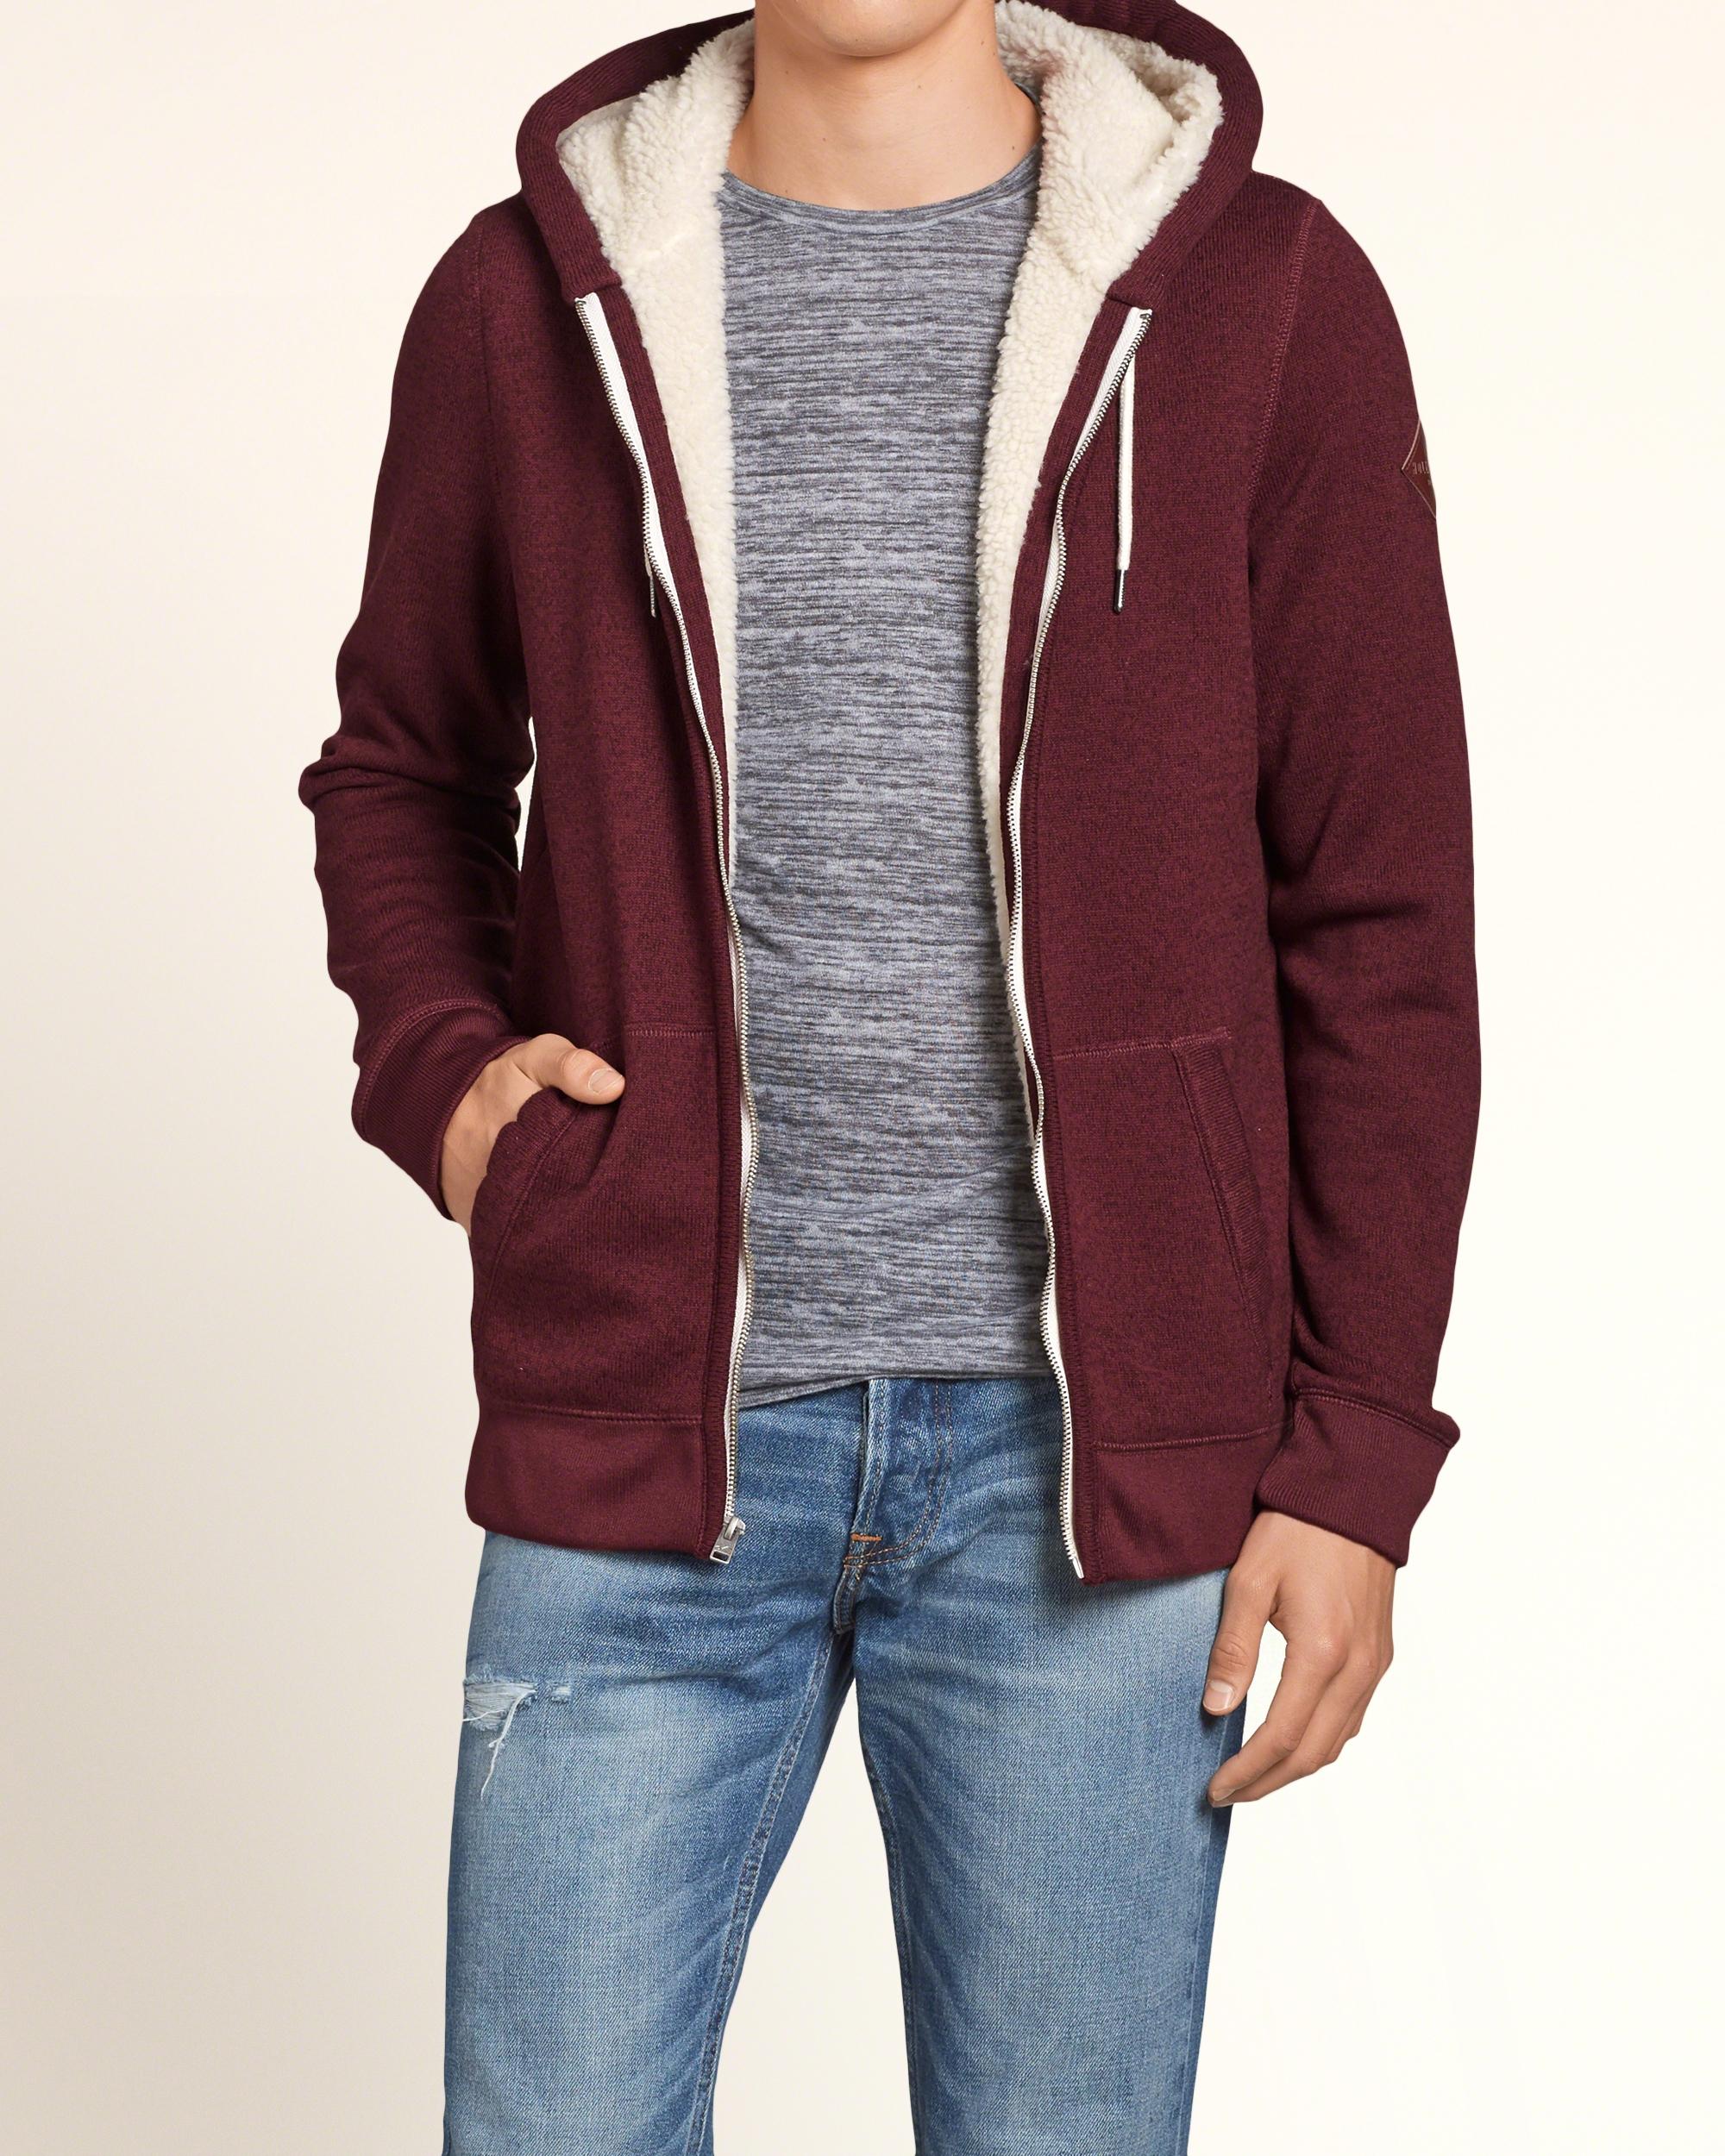 Hollister Oberbekleidung Returns Exchanges Hollister Pullover Hollister Hoodies Hollister Jeans: Hollister Sherpa Lined Hoodie For Men